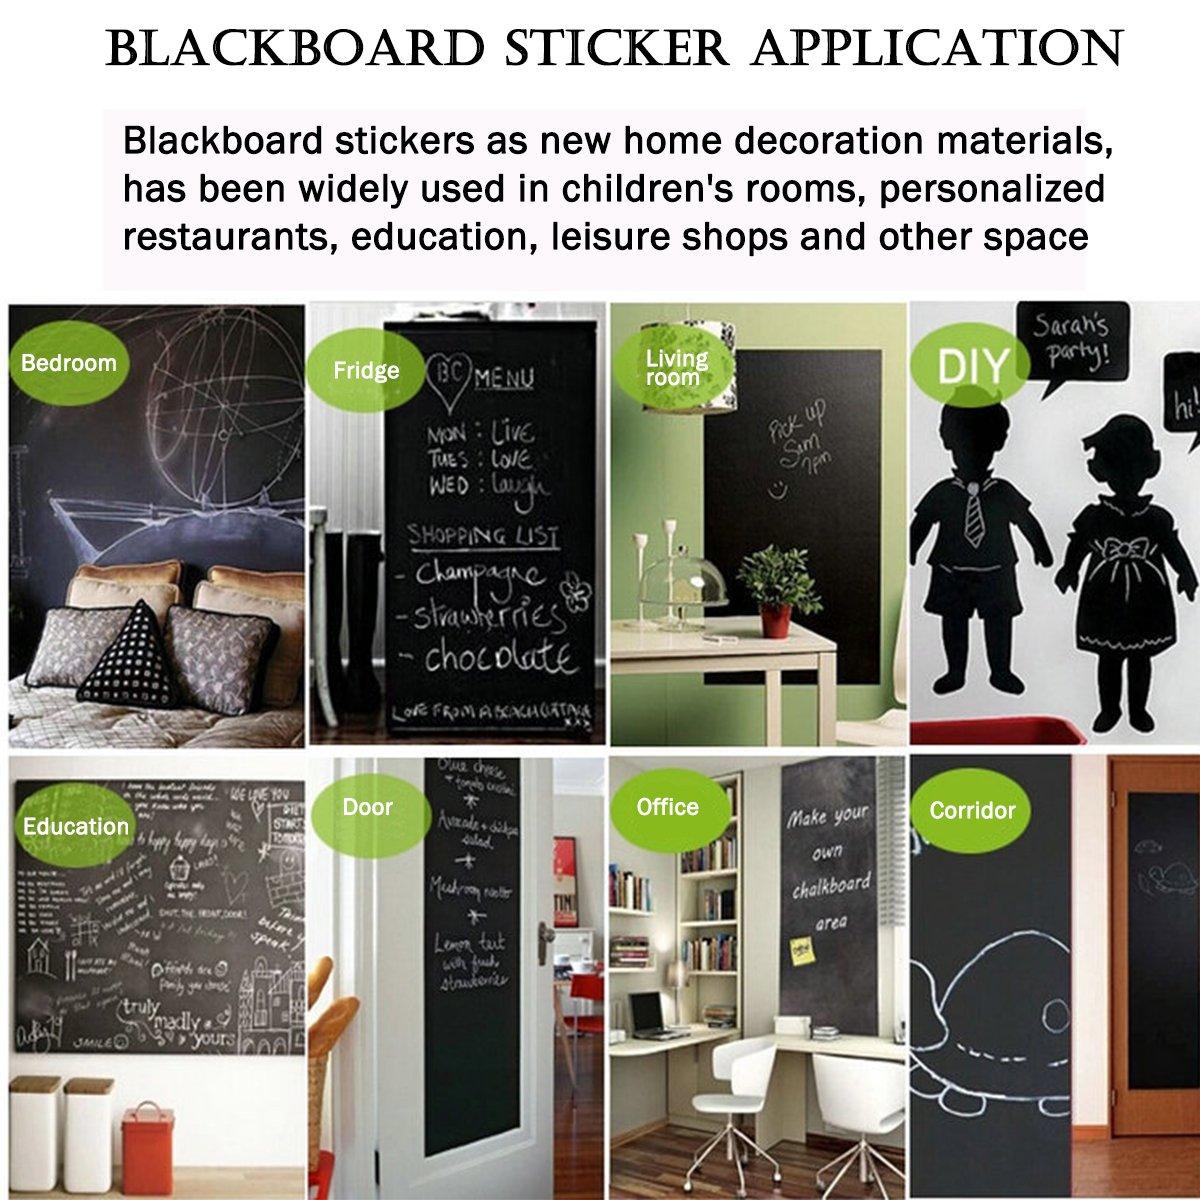 Cusfull Self Adhesive Blackboard Removable Chalkboard Wall Sticker For  Home, Office U0026 Decor 35.4